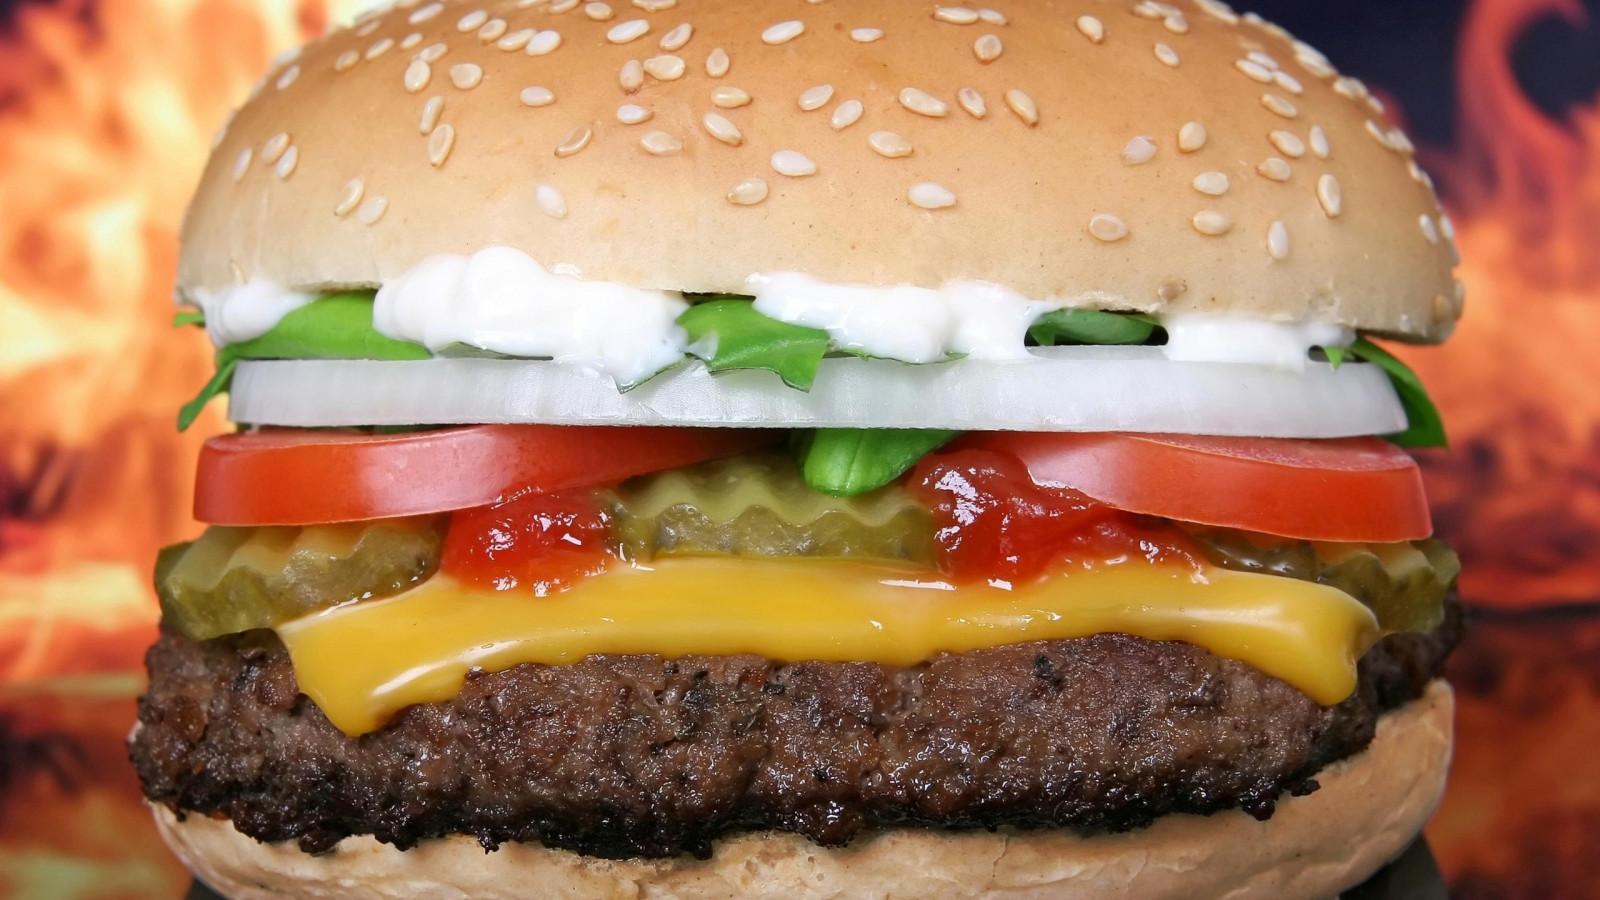 Burger king wallpaper photo 11